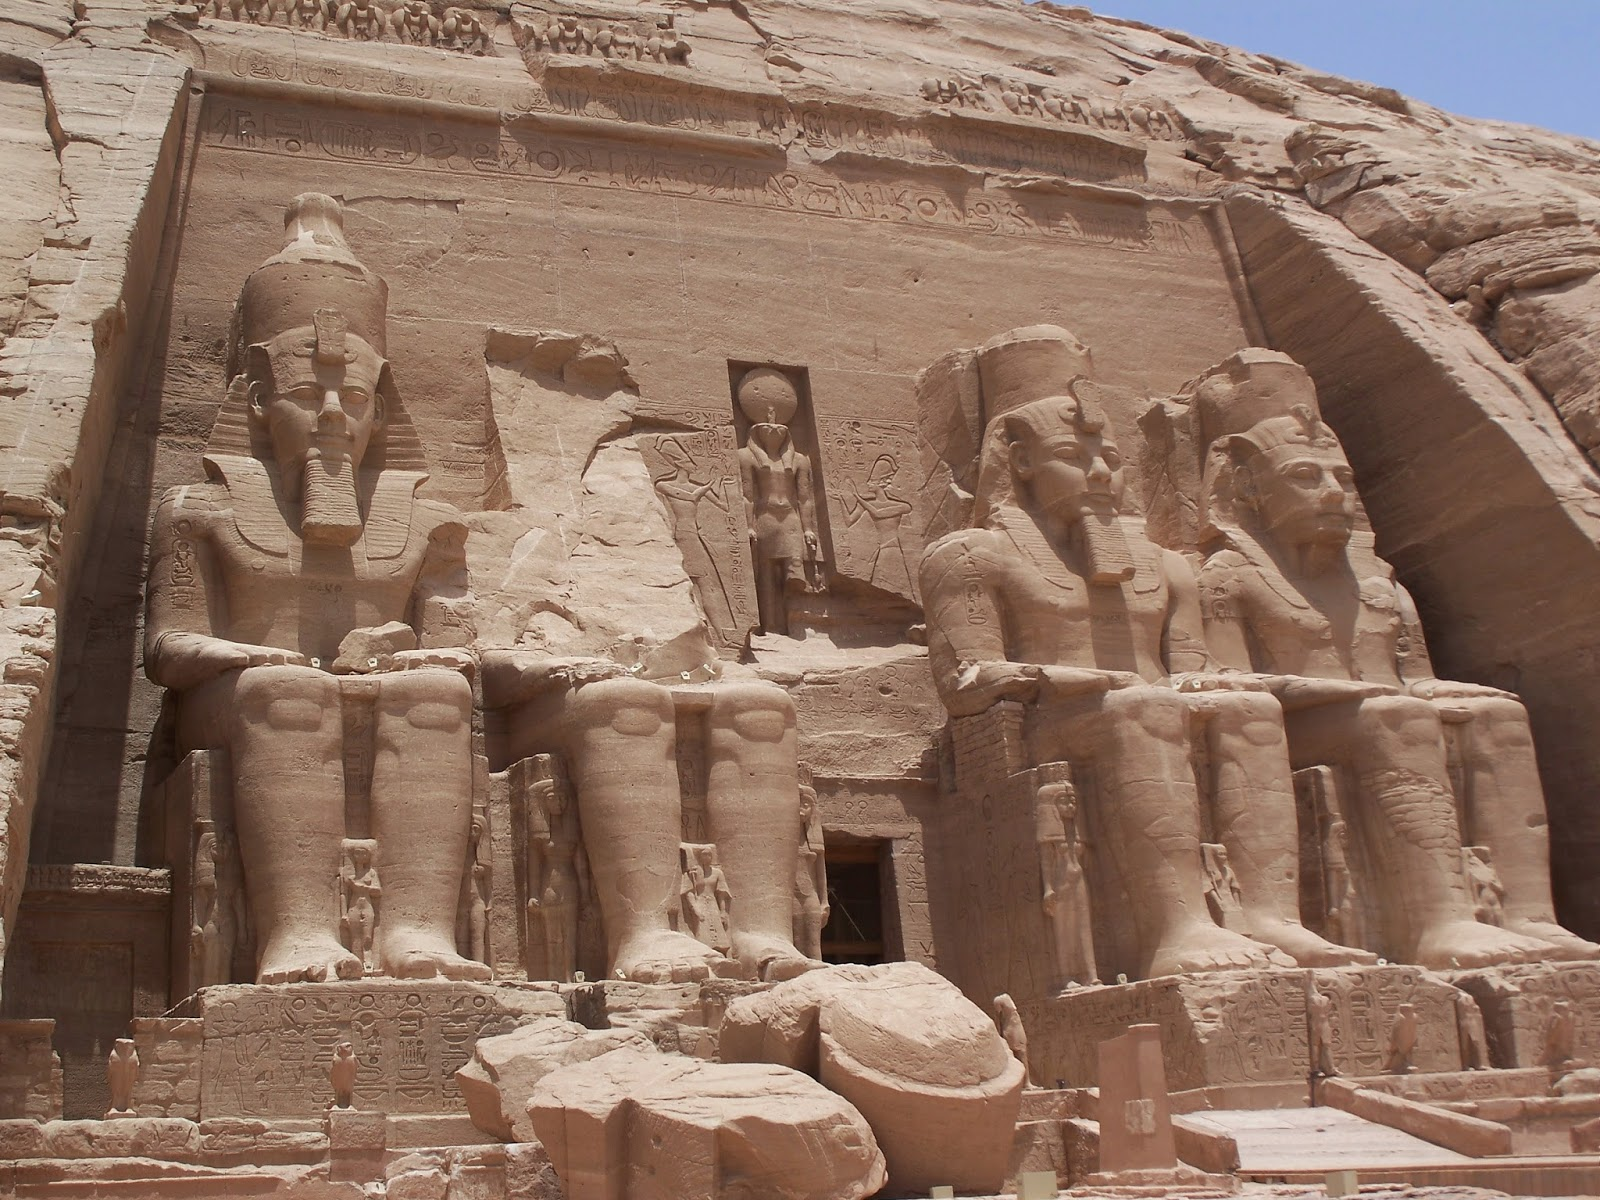 5 Gua Bersejarah dan Paling Menakjubkan di Dunia